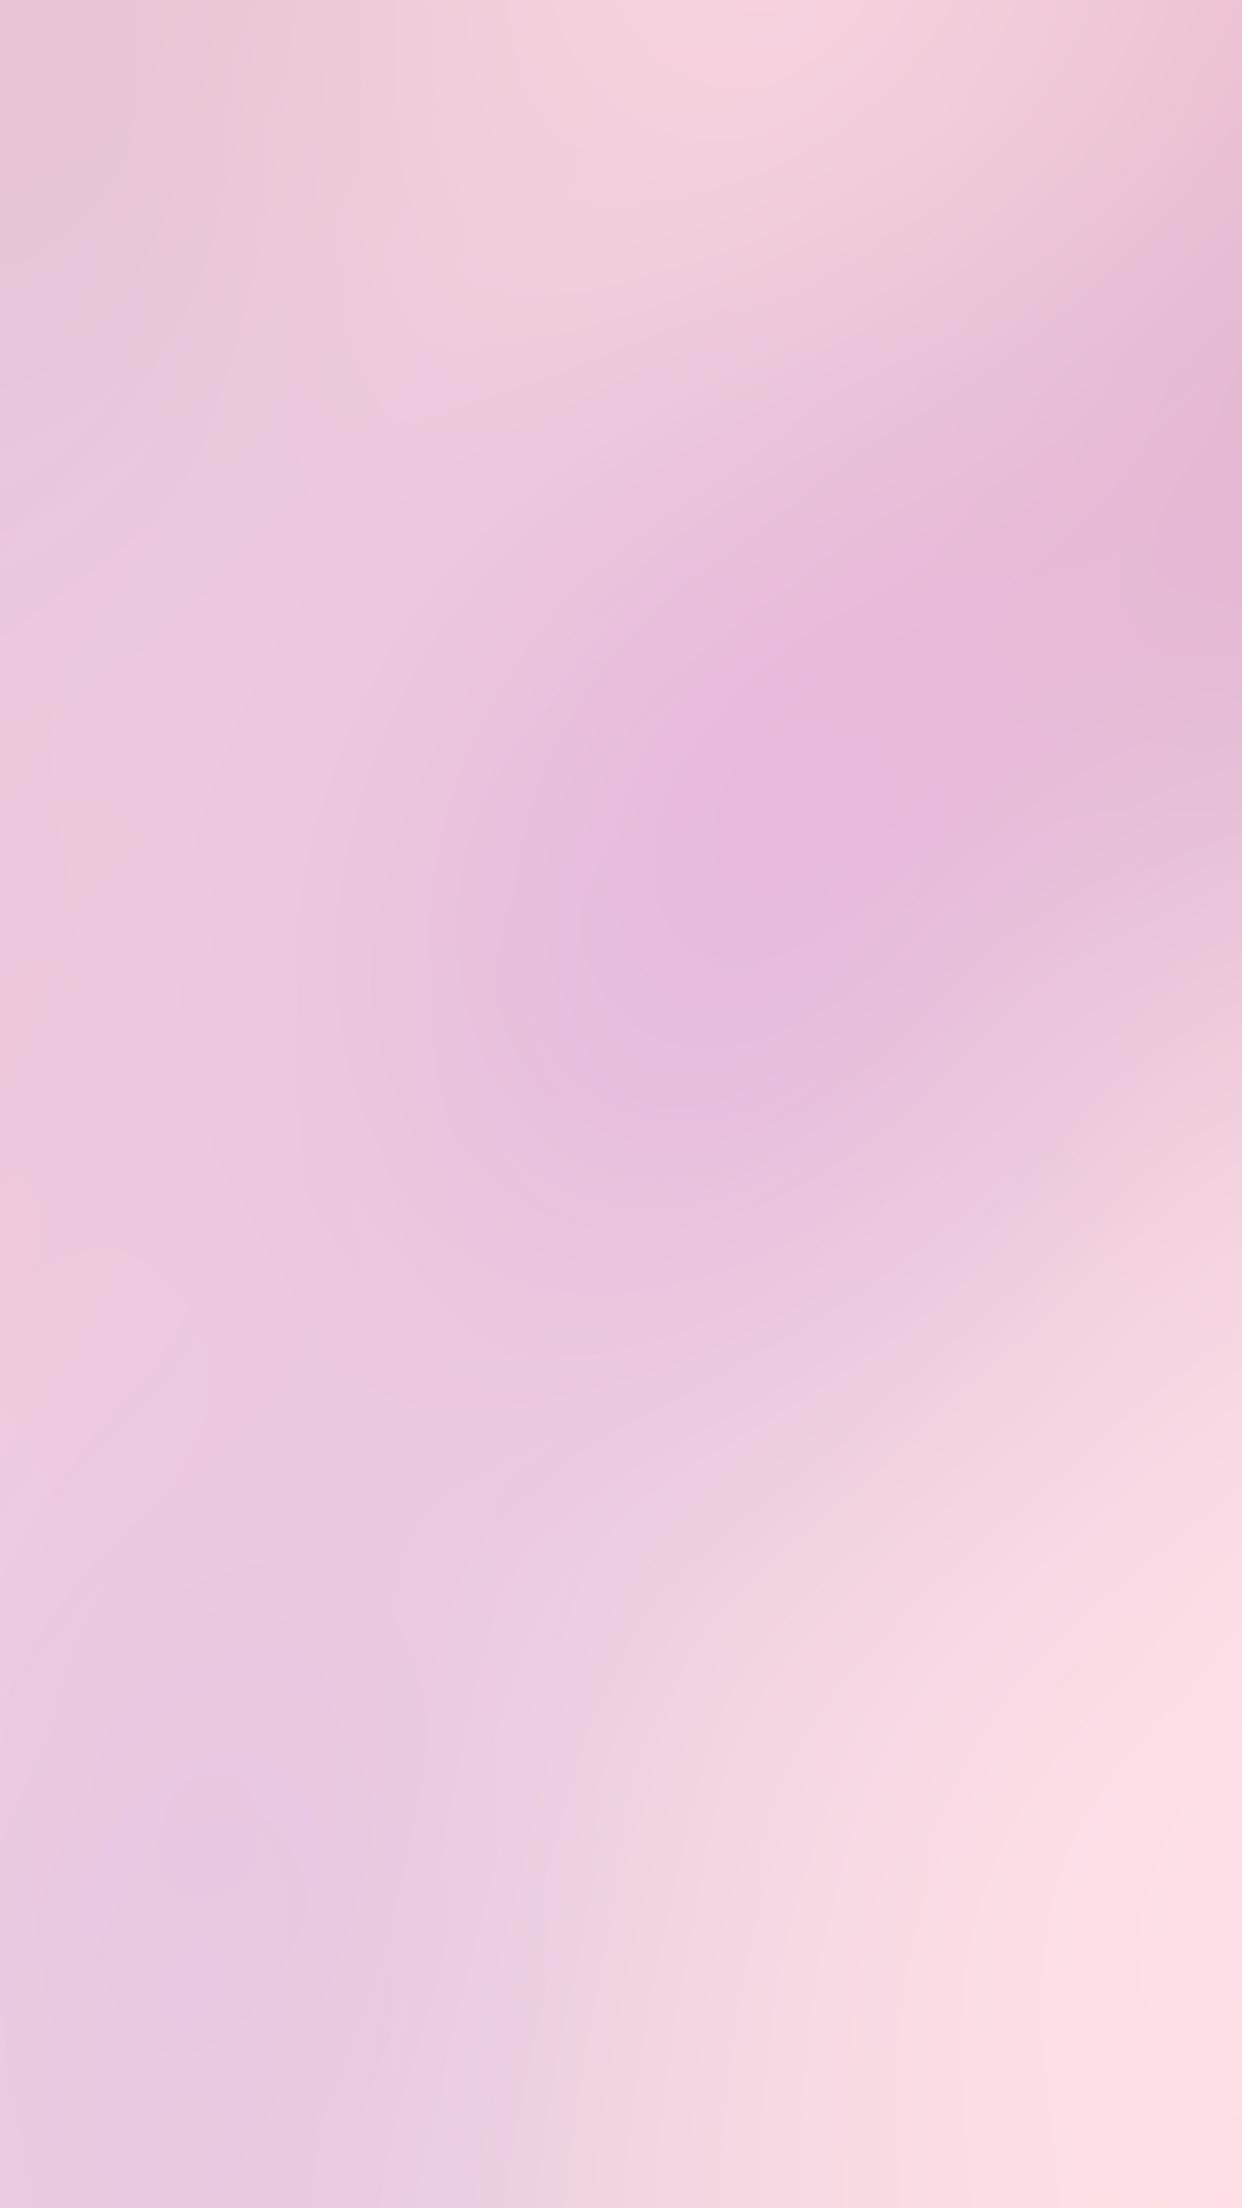 Cute Pink Wallpaper For Iphone 6 Si09 Soft Pink Baby Gradation Blur Wallpaper